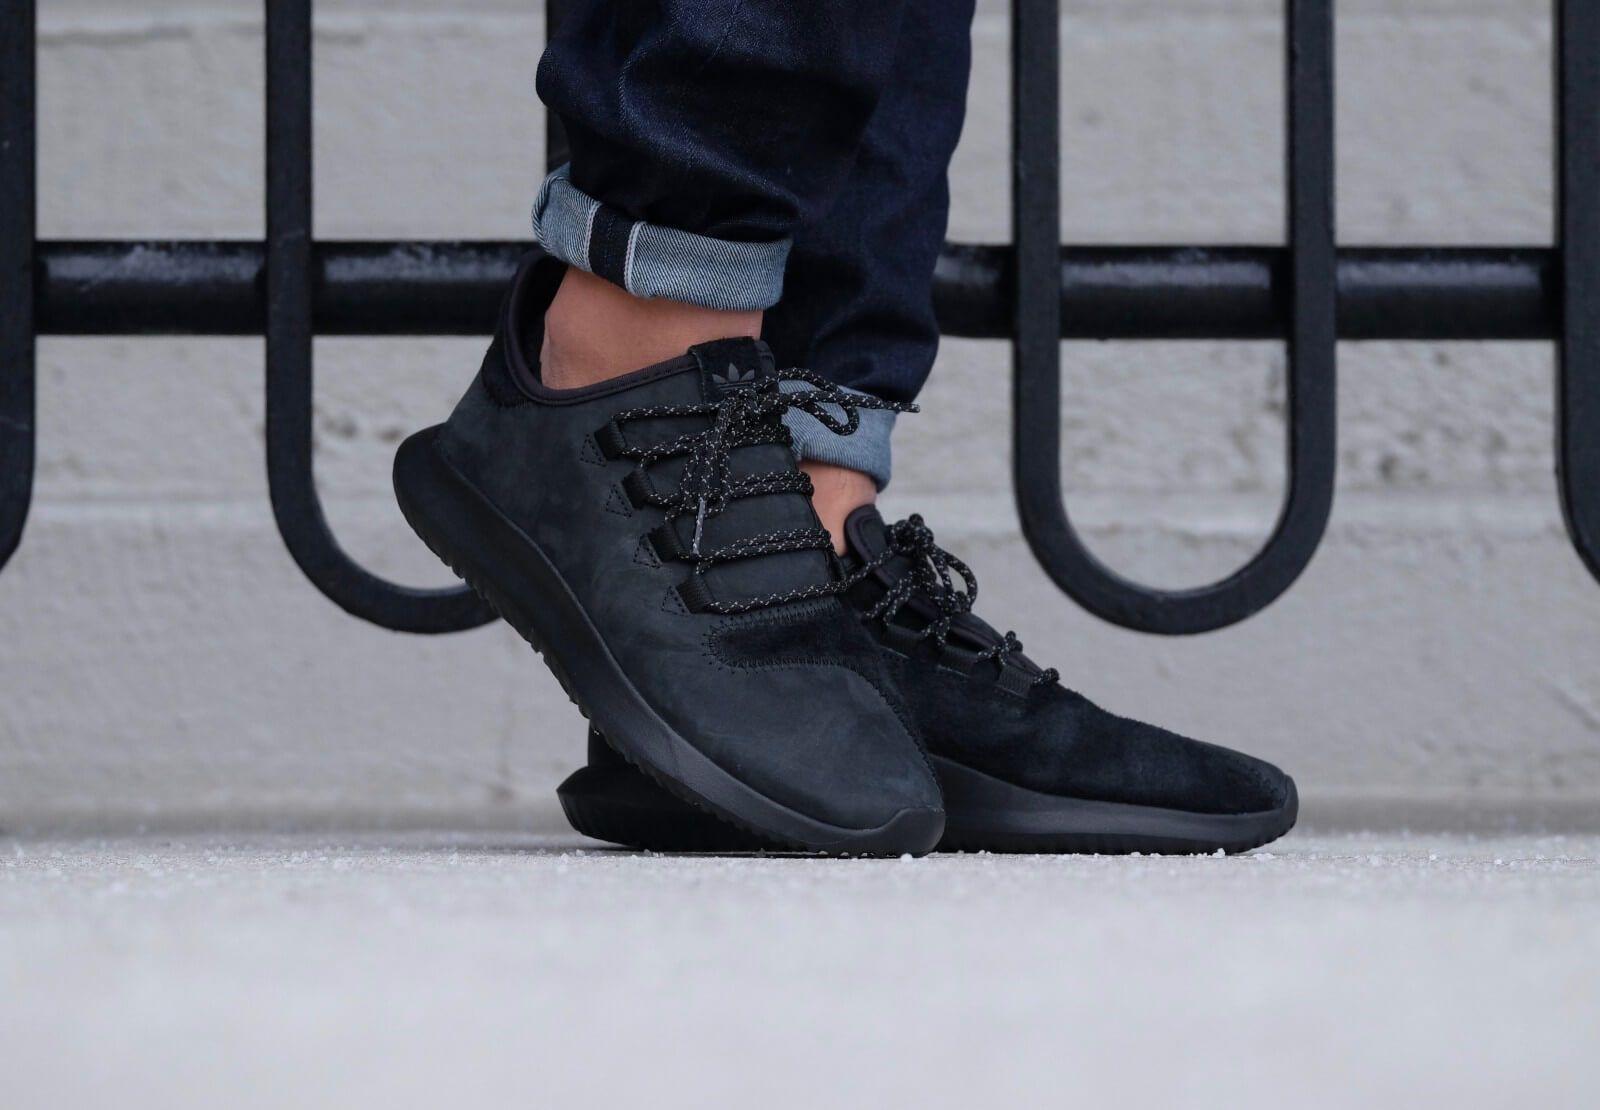 new product 73c5b 3bbe5 Adidas Tubular Shadow Core Black/Footwear White - BB8942 ...